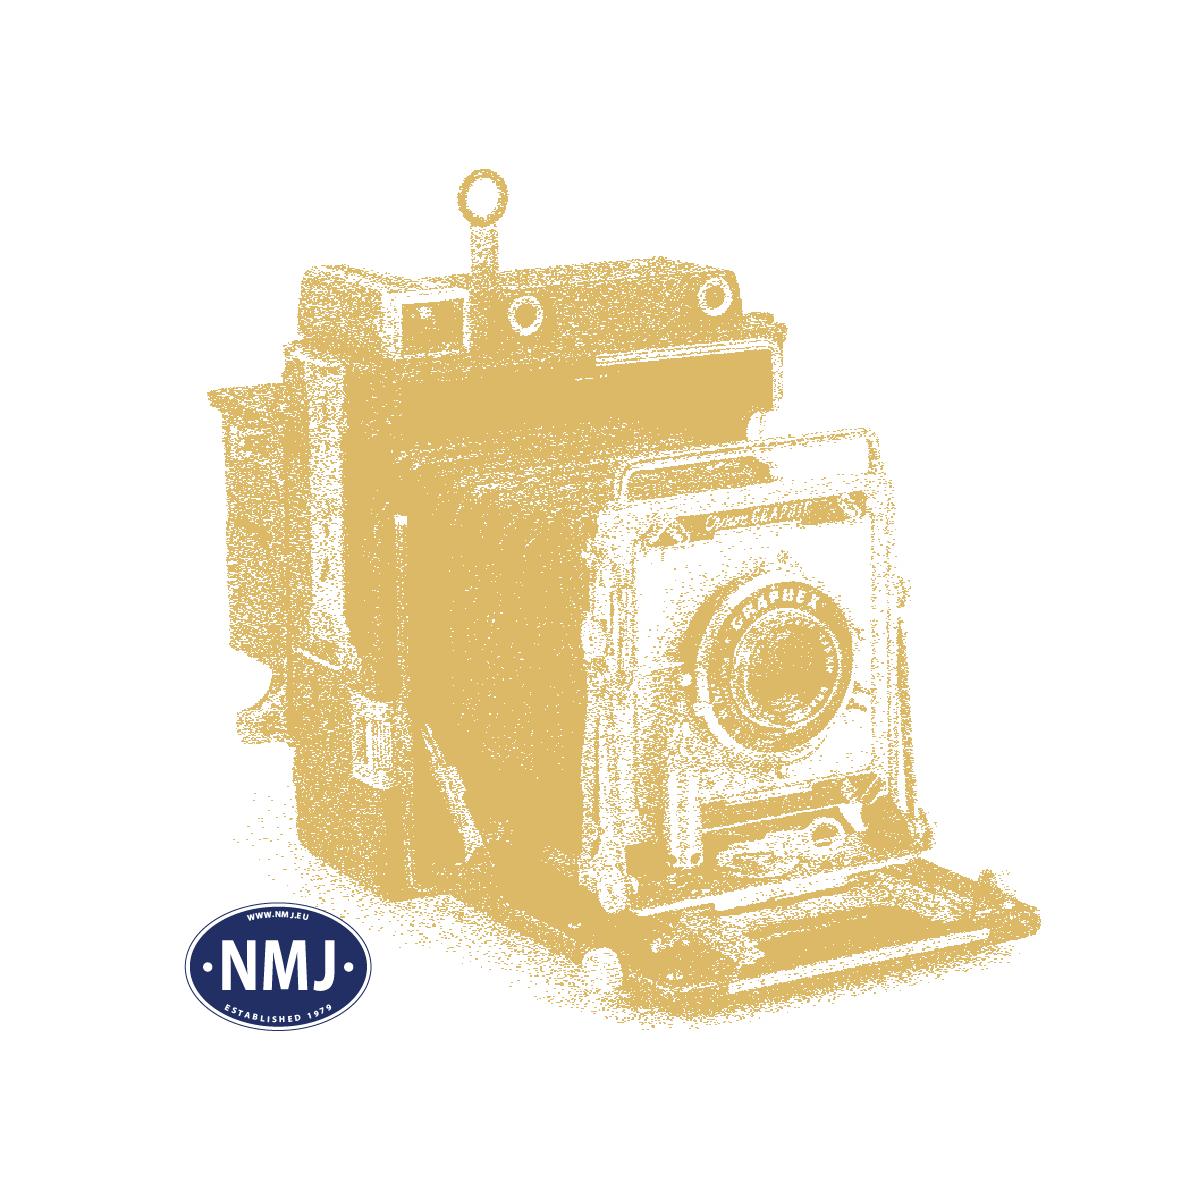 NMJT93003 - NMJ Topline SJ Y1 1308, Orange, DCC m/ Sound